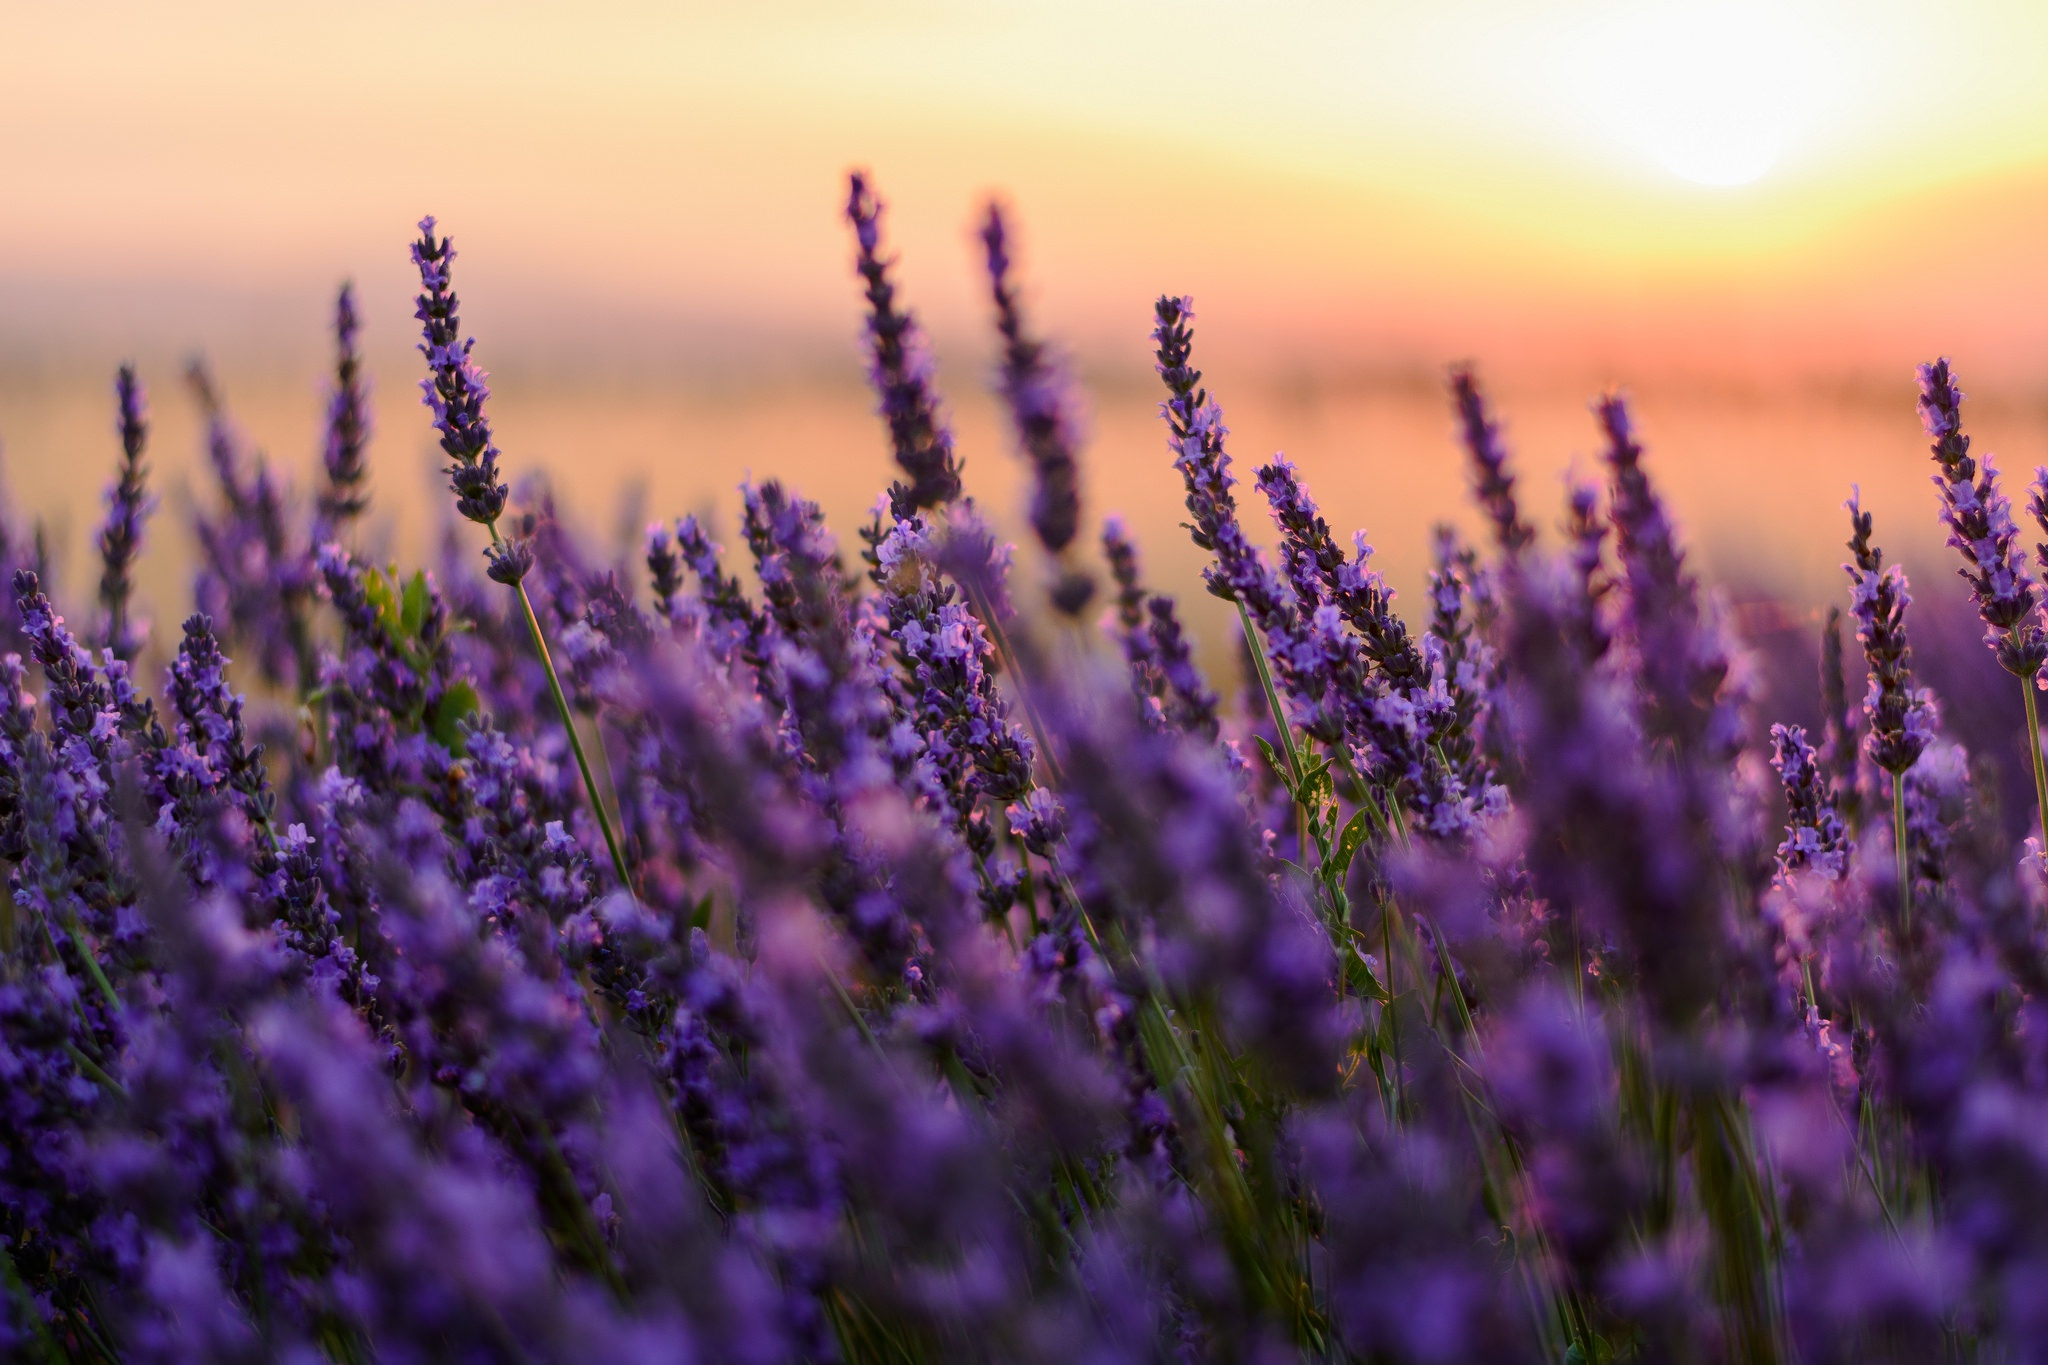 hinh anh lavender 48